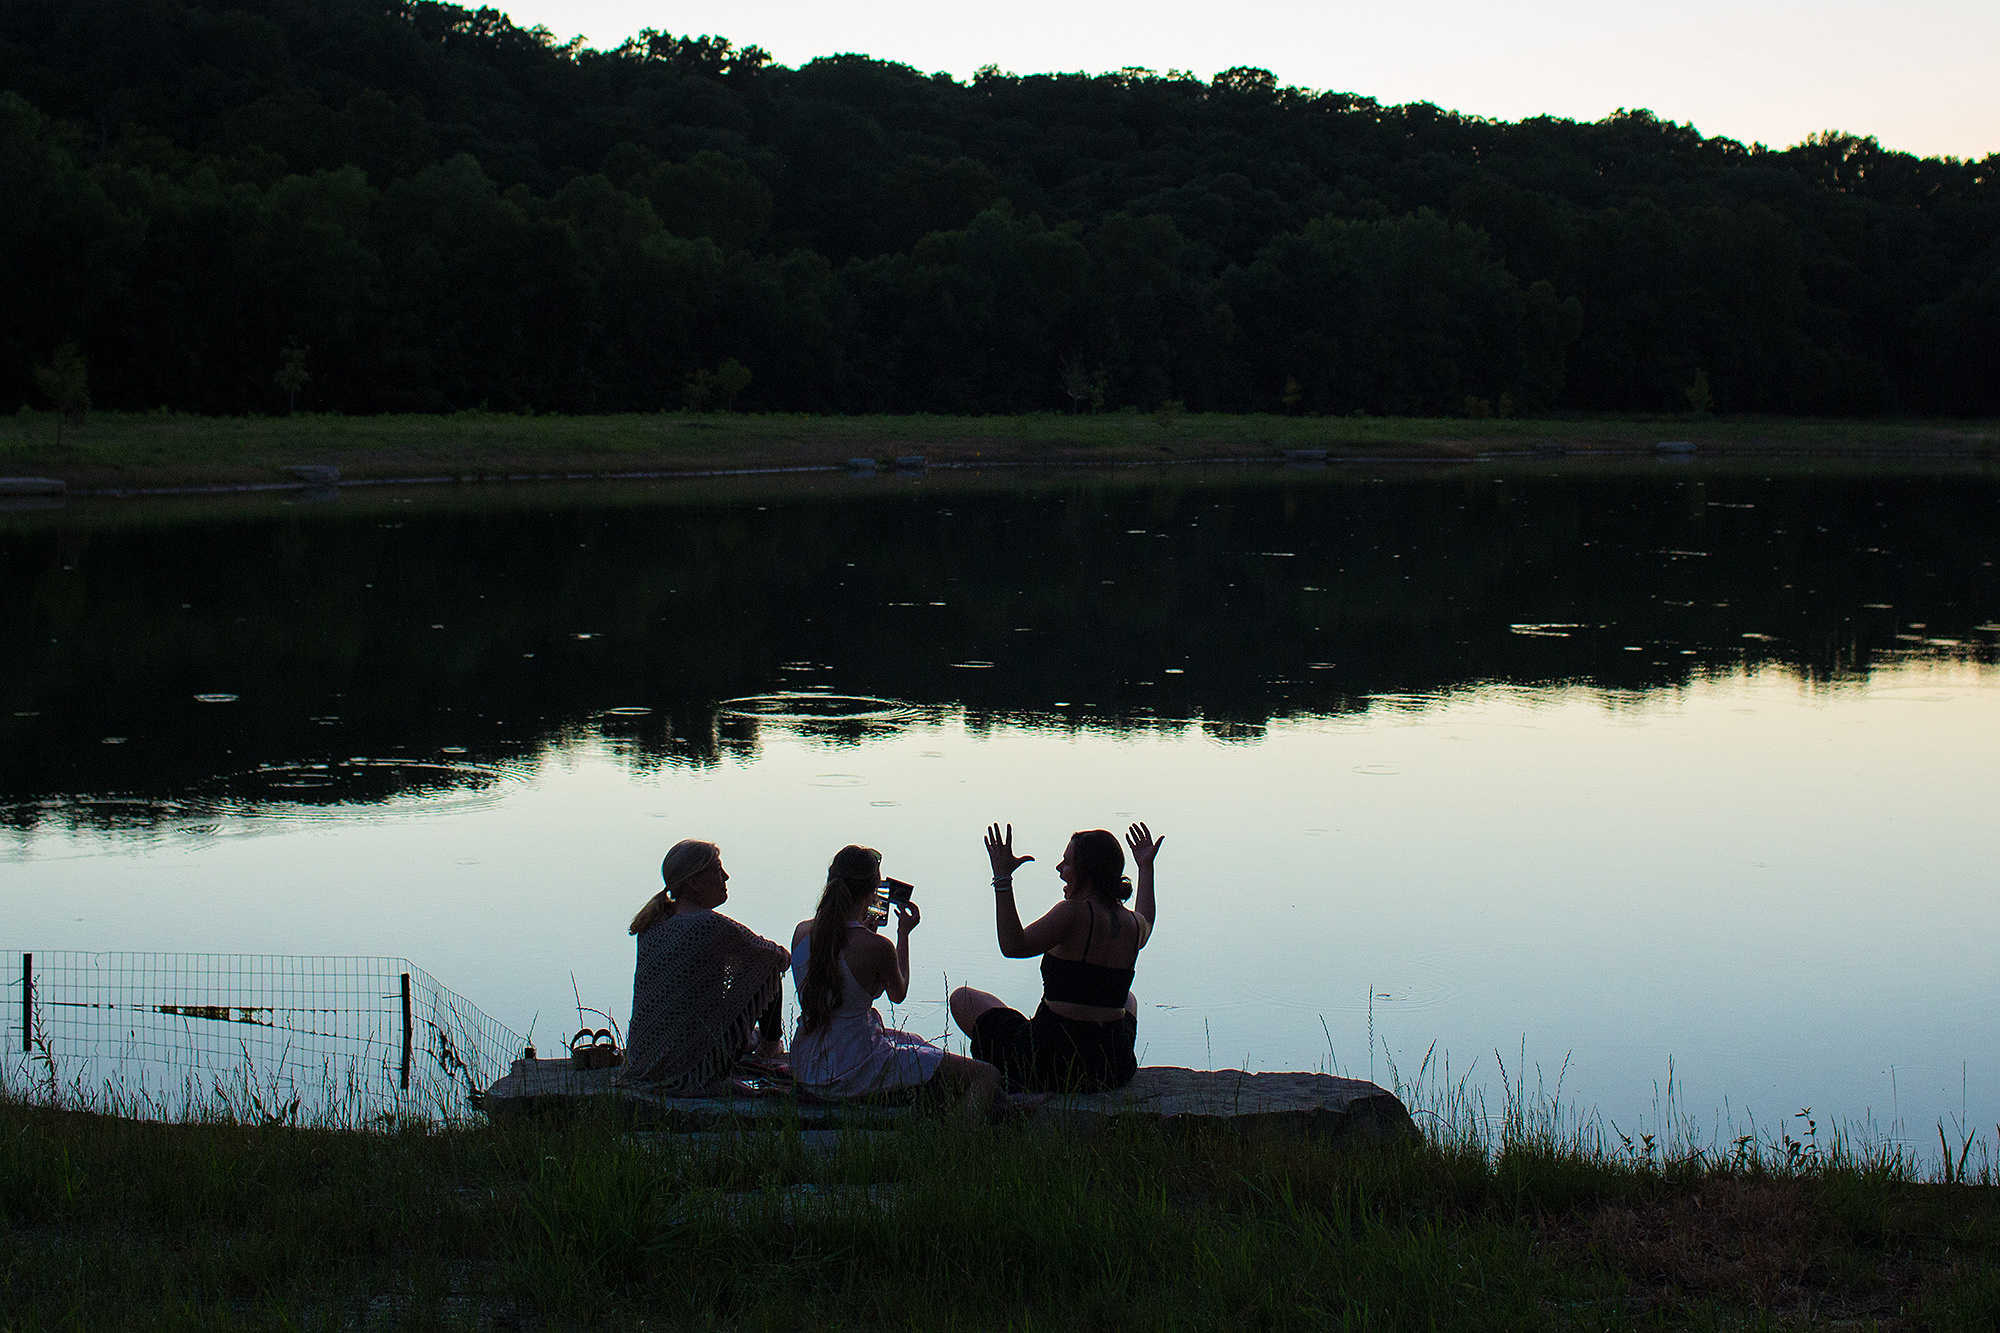 12-three-friends-sitting-by-lake-sarah-corbett-photography-polaroids.jpg